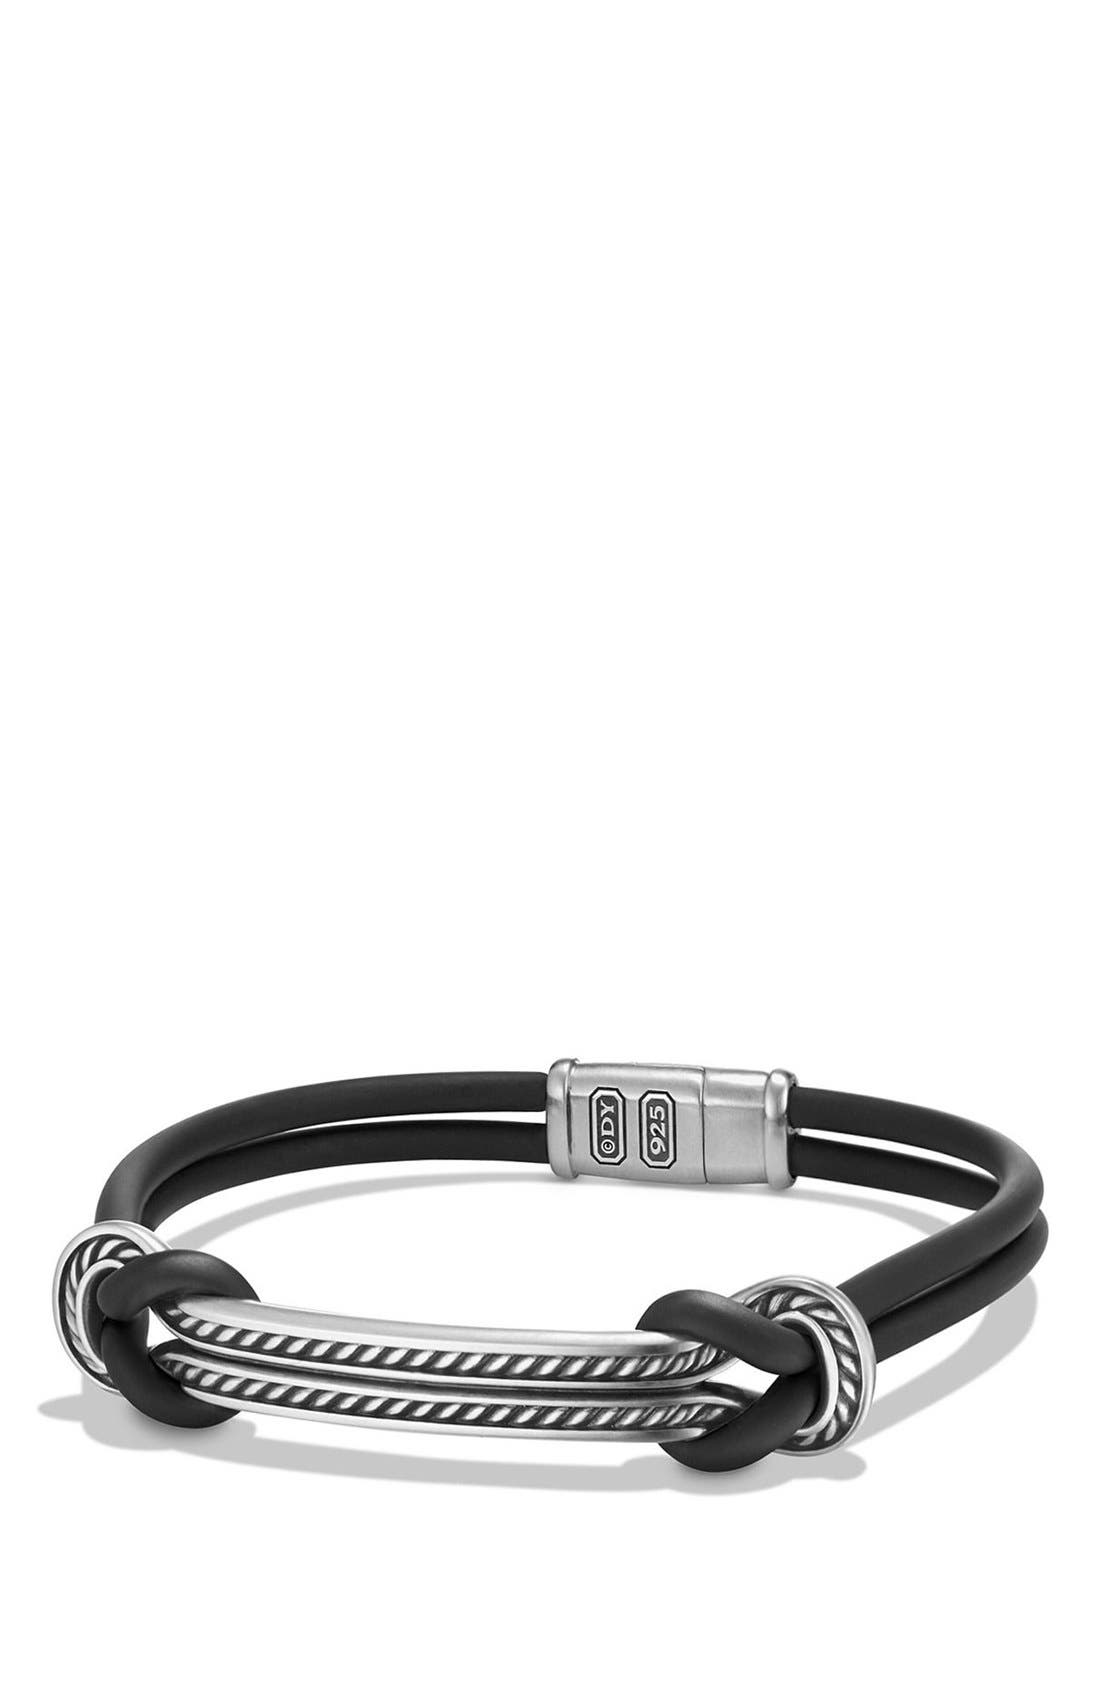 David Yurman 'Maritime' Rubber Reef Knot ID Bracelet